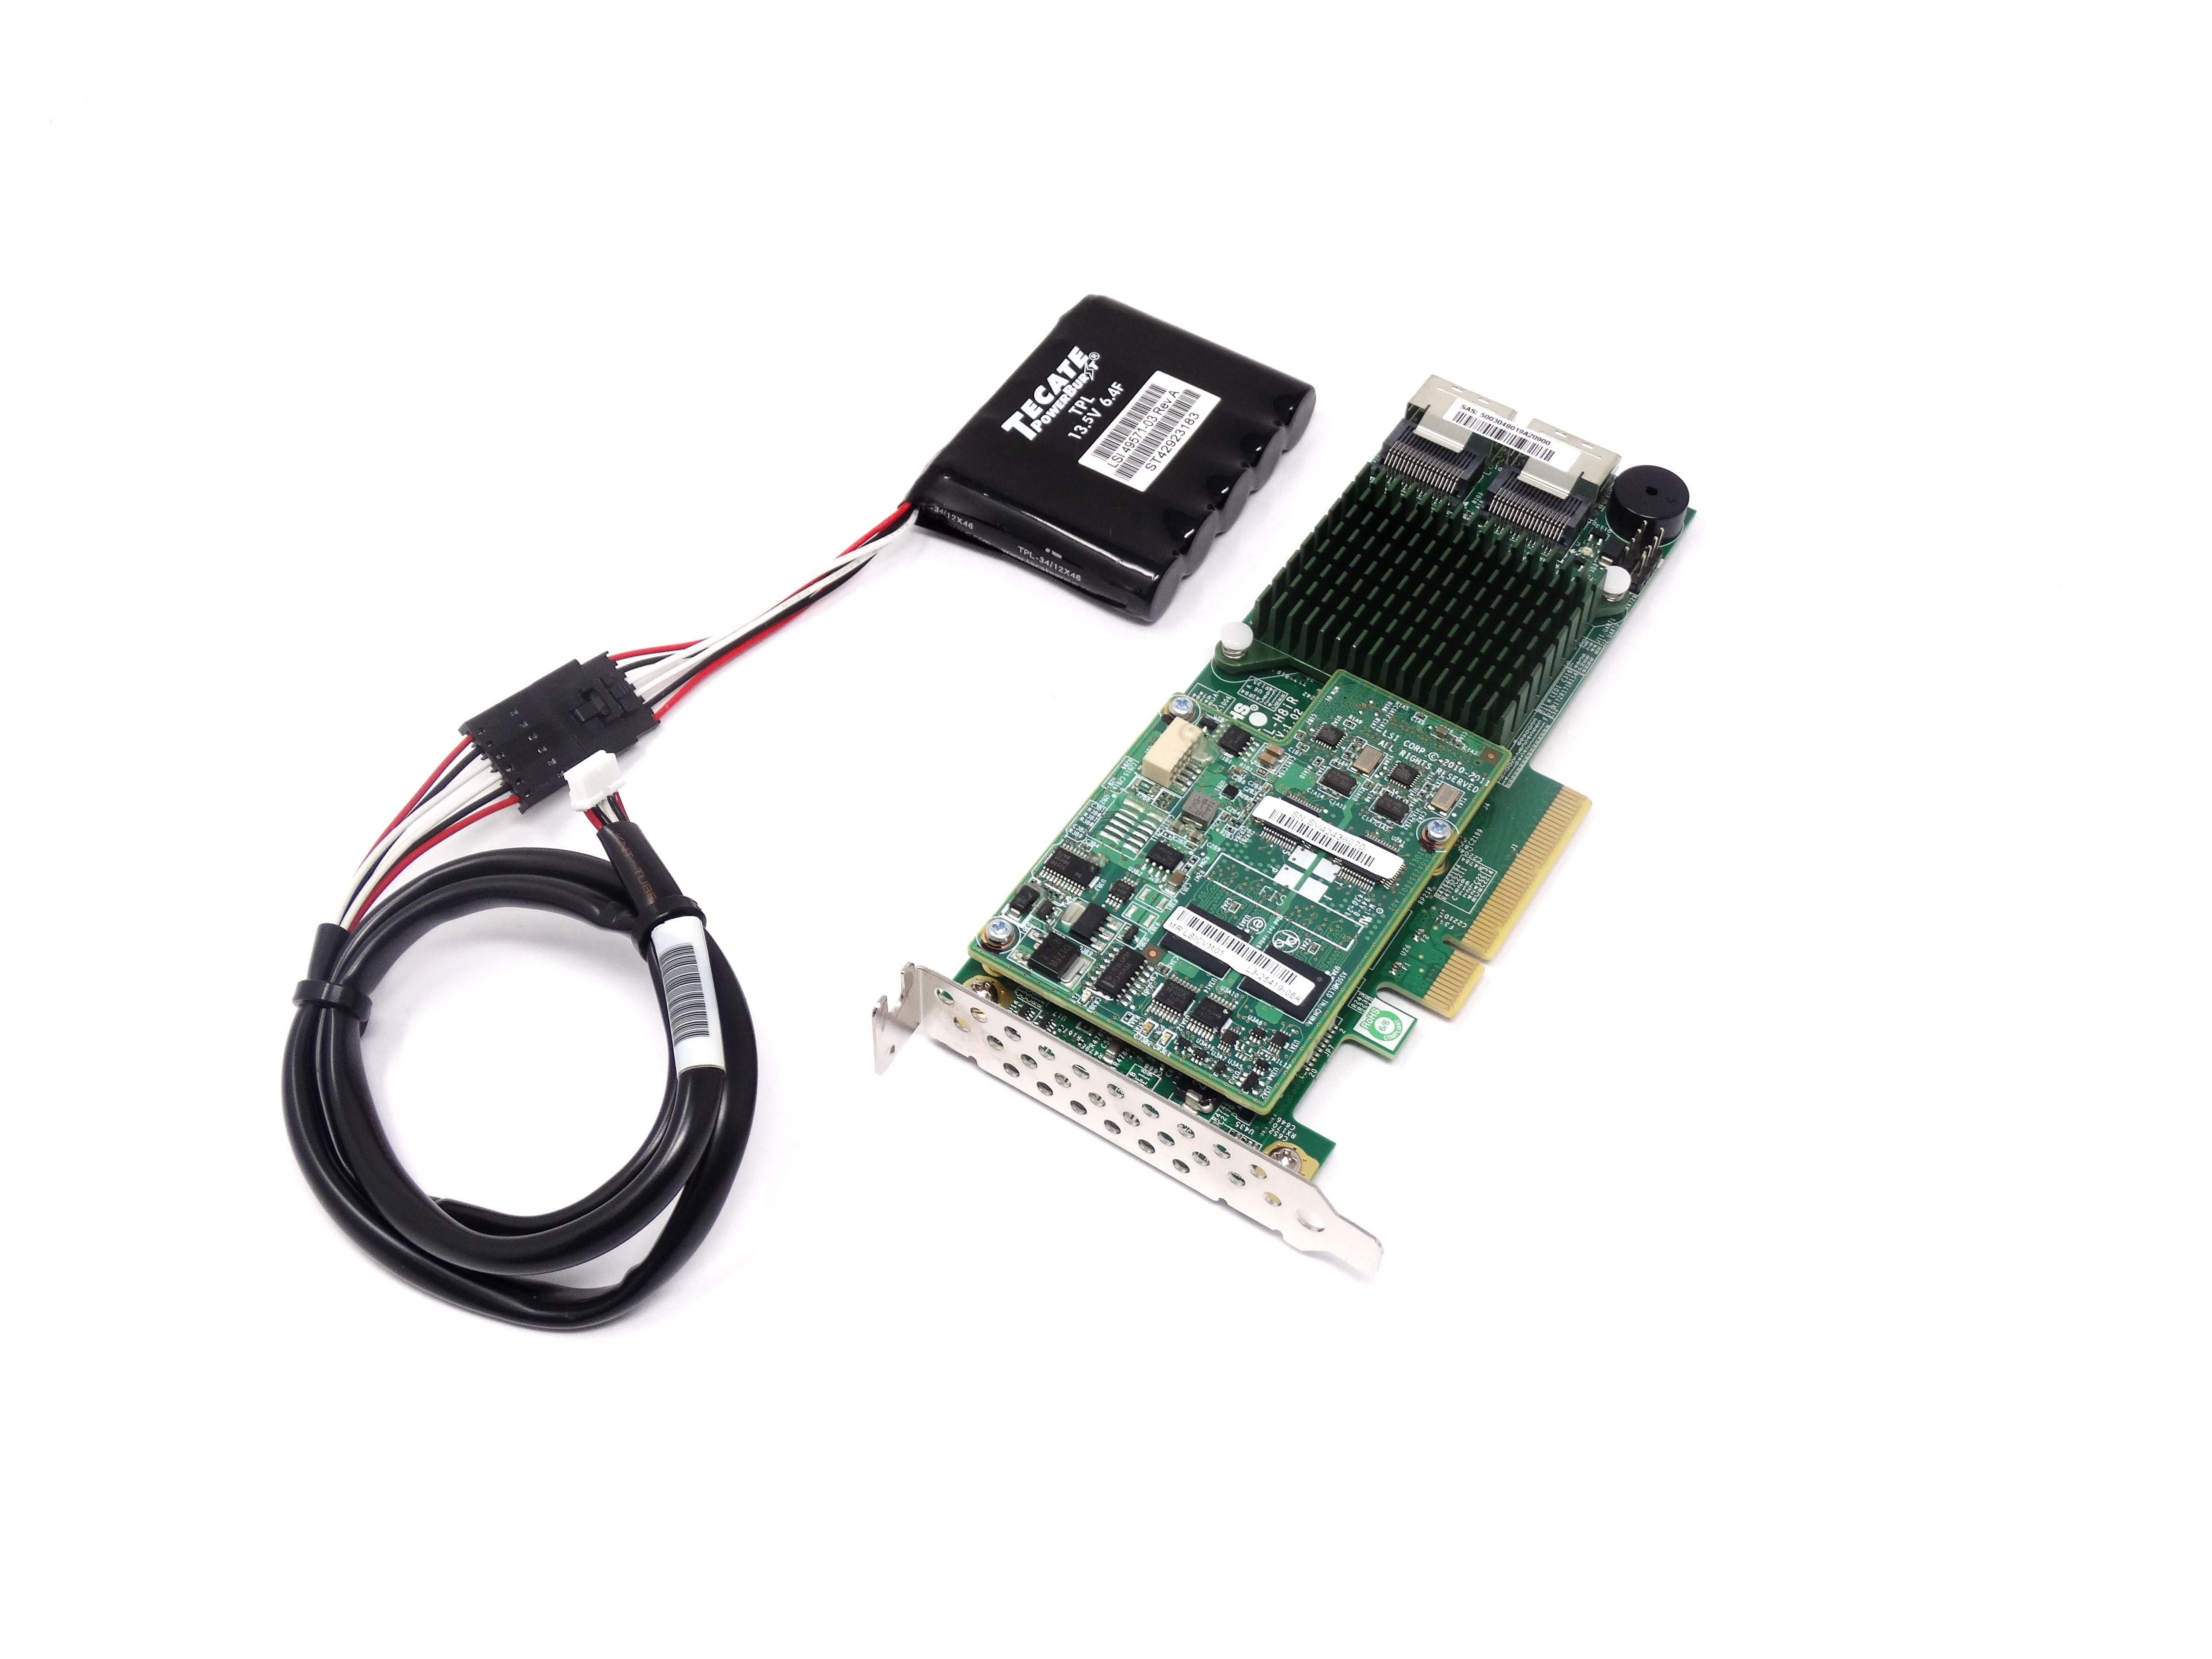 Supermicro 8 Port 6Gbps SAS SATA Raid Controller w/ CacheVault Kit LSICVM01 (AOC-S2208L-H8IR)